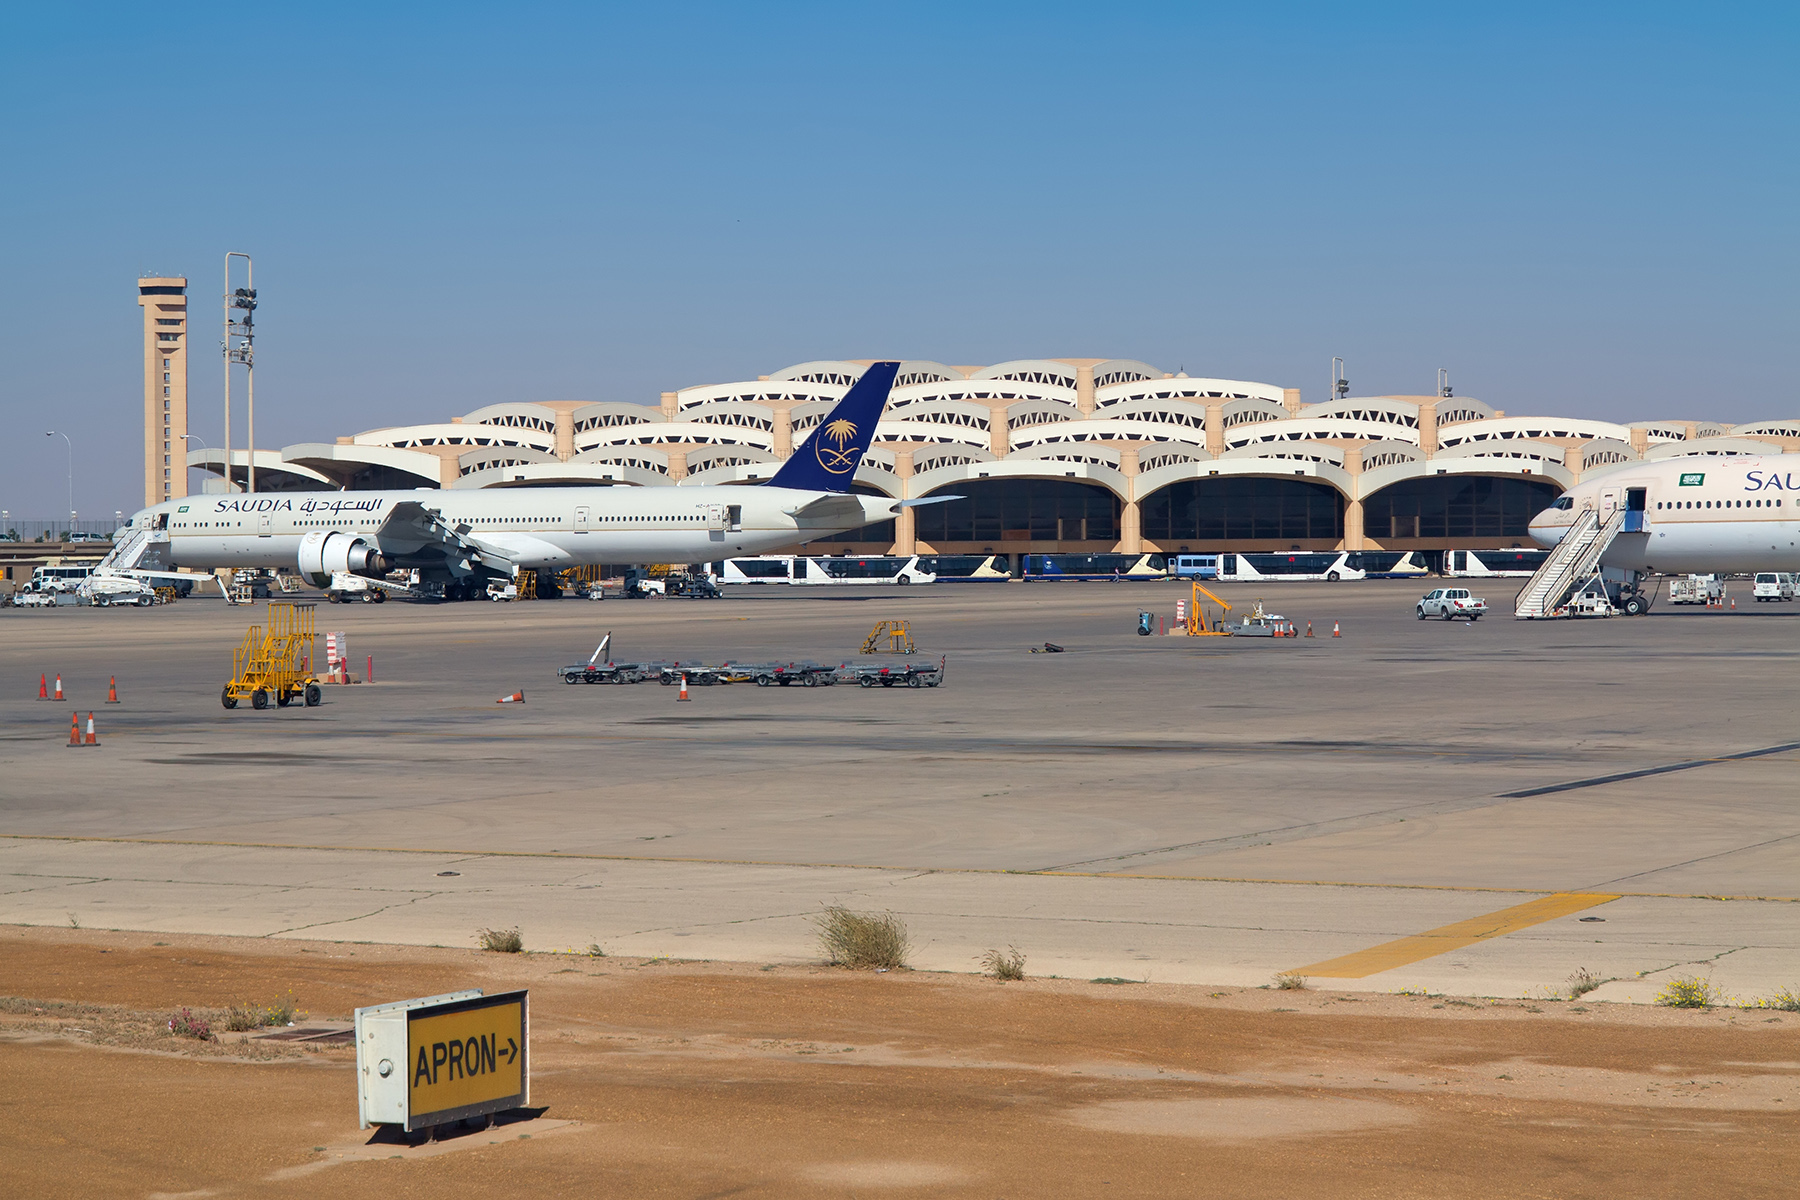 King Khalid International Airport in Riyadh